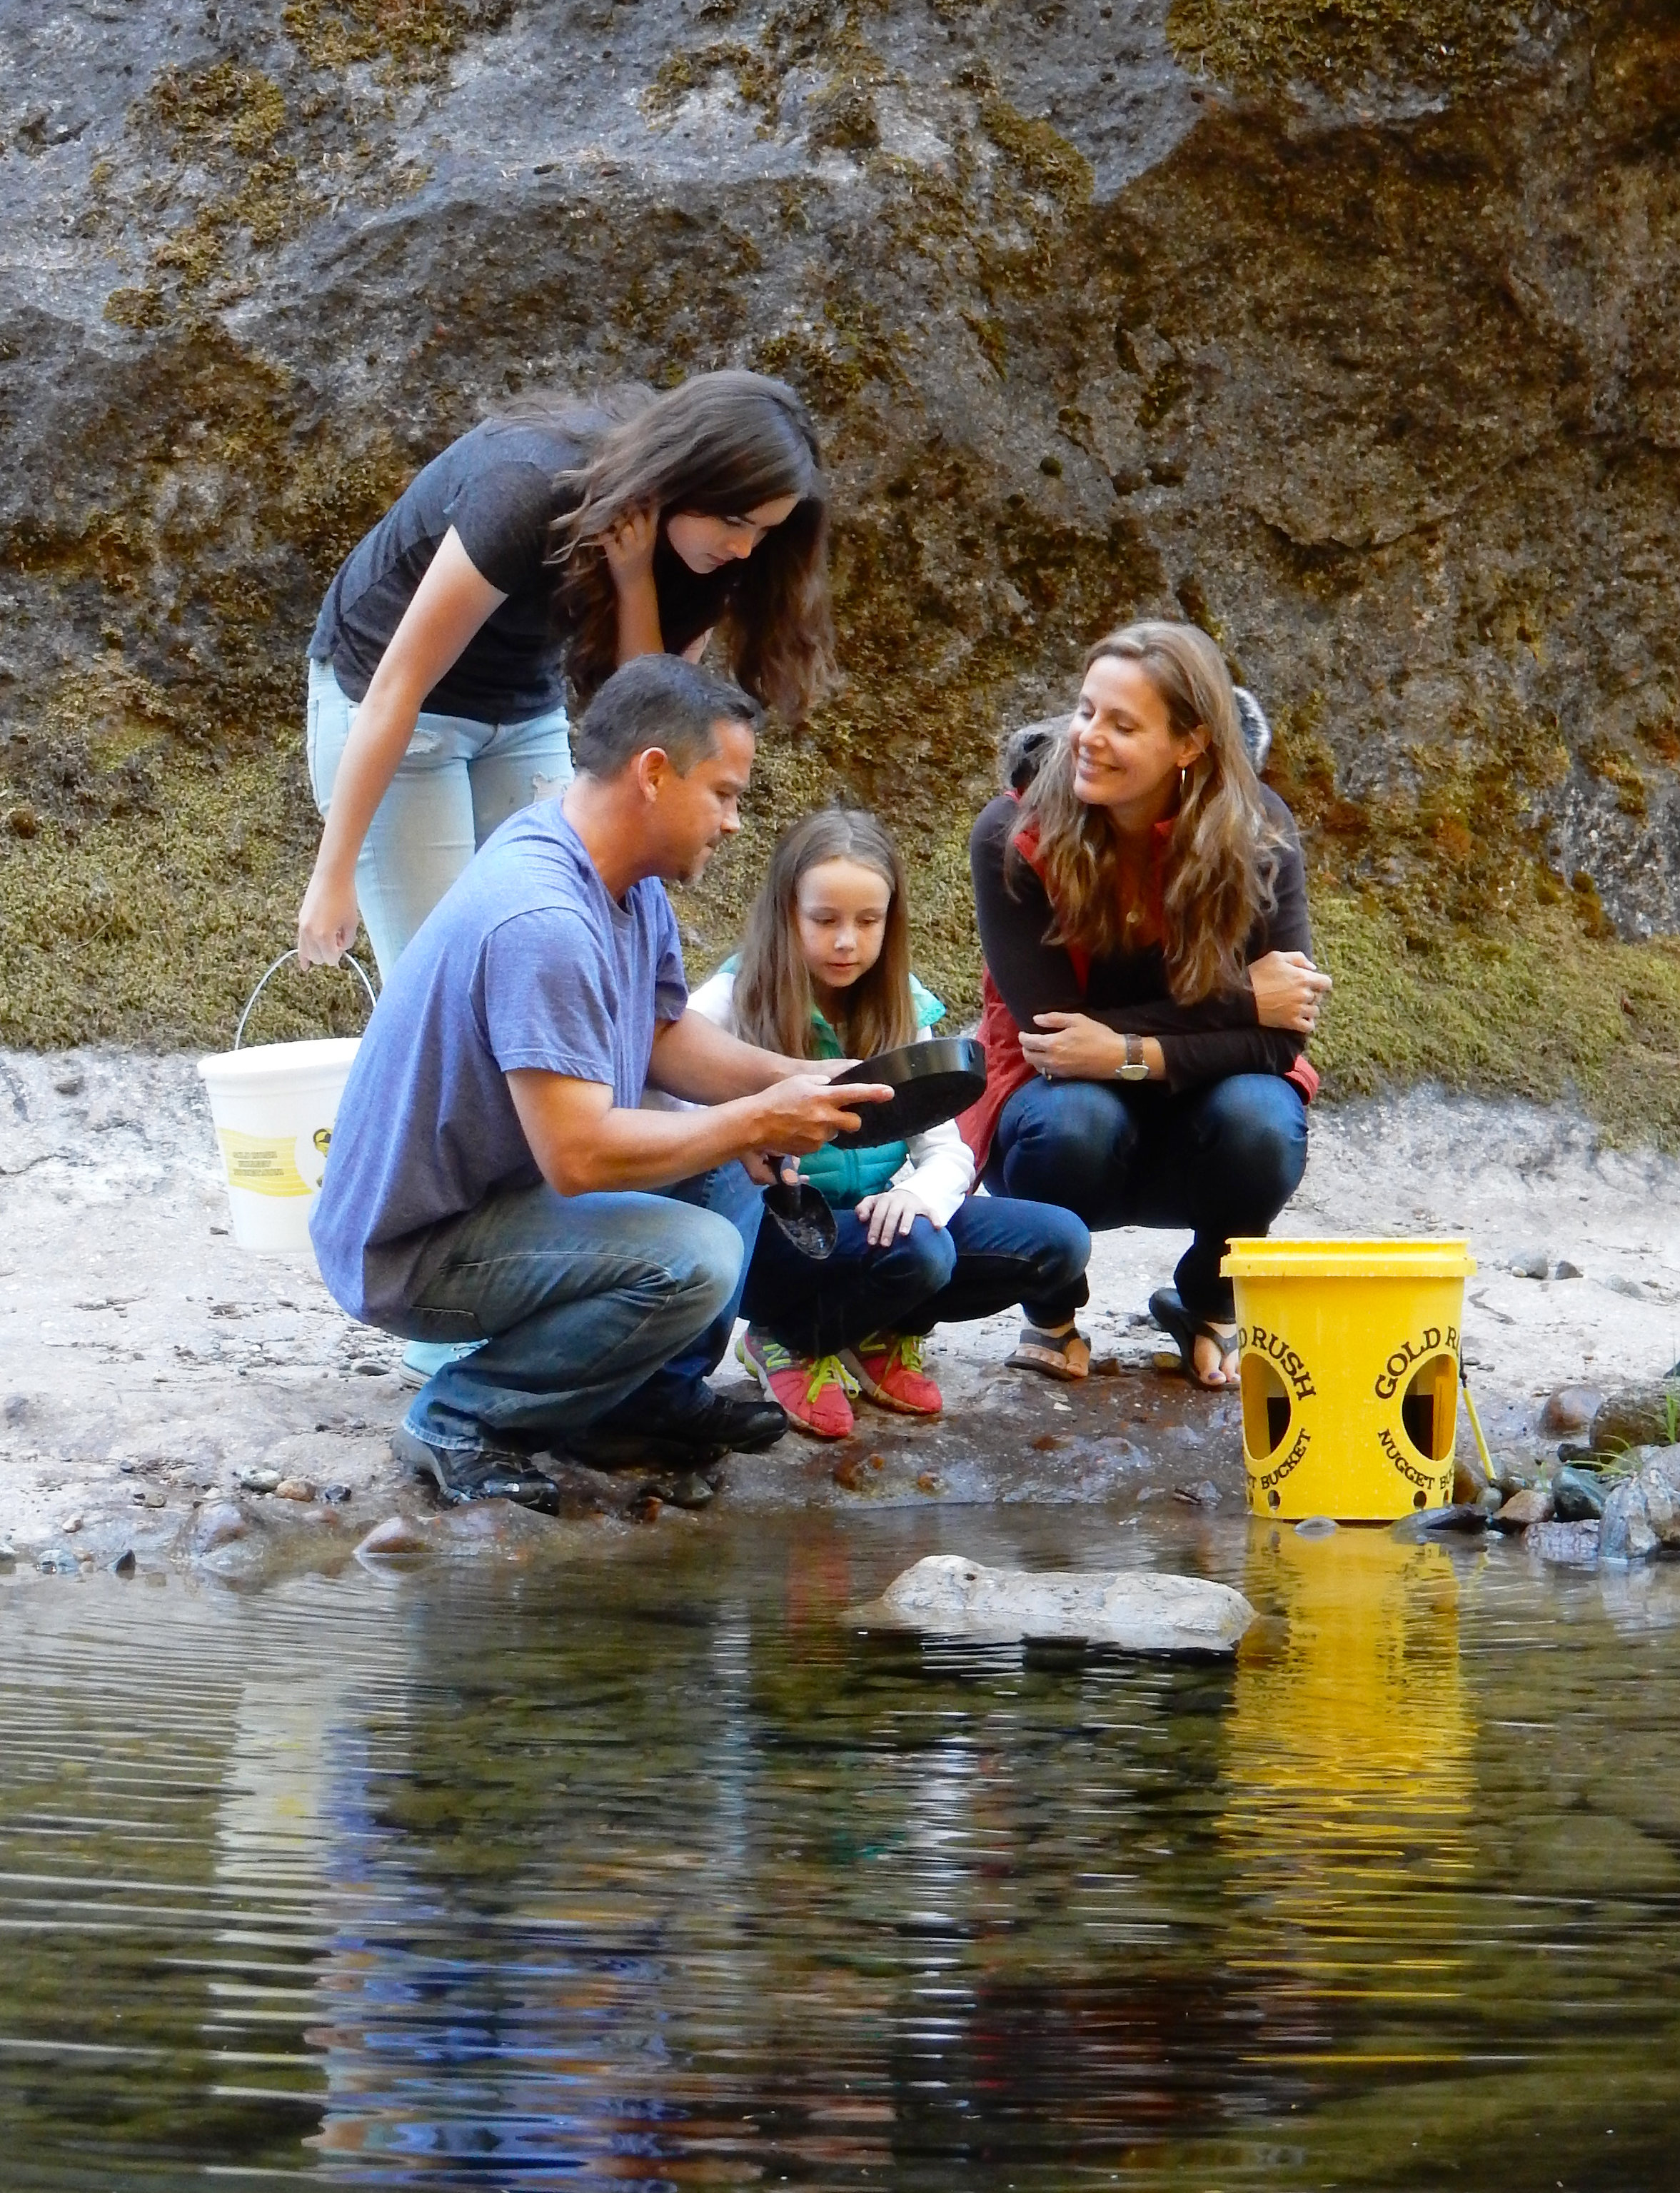 Gold Panning at Sharps Creek Recreation Site